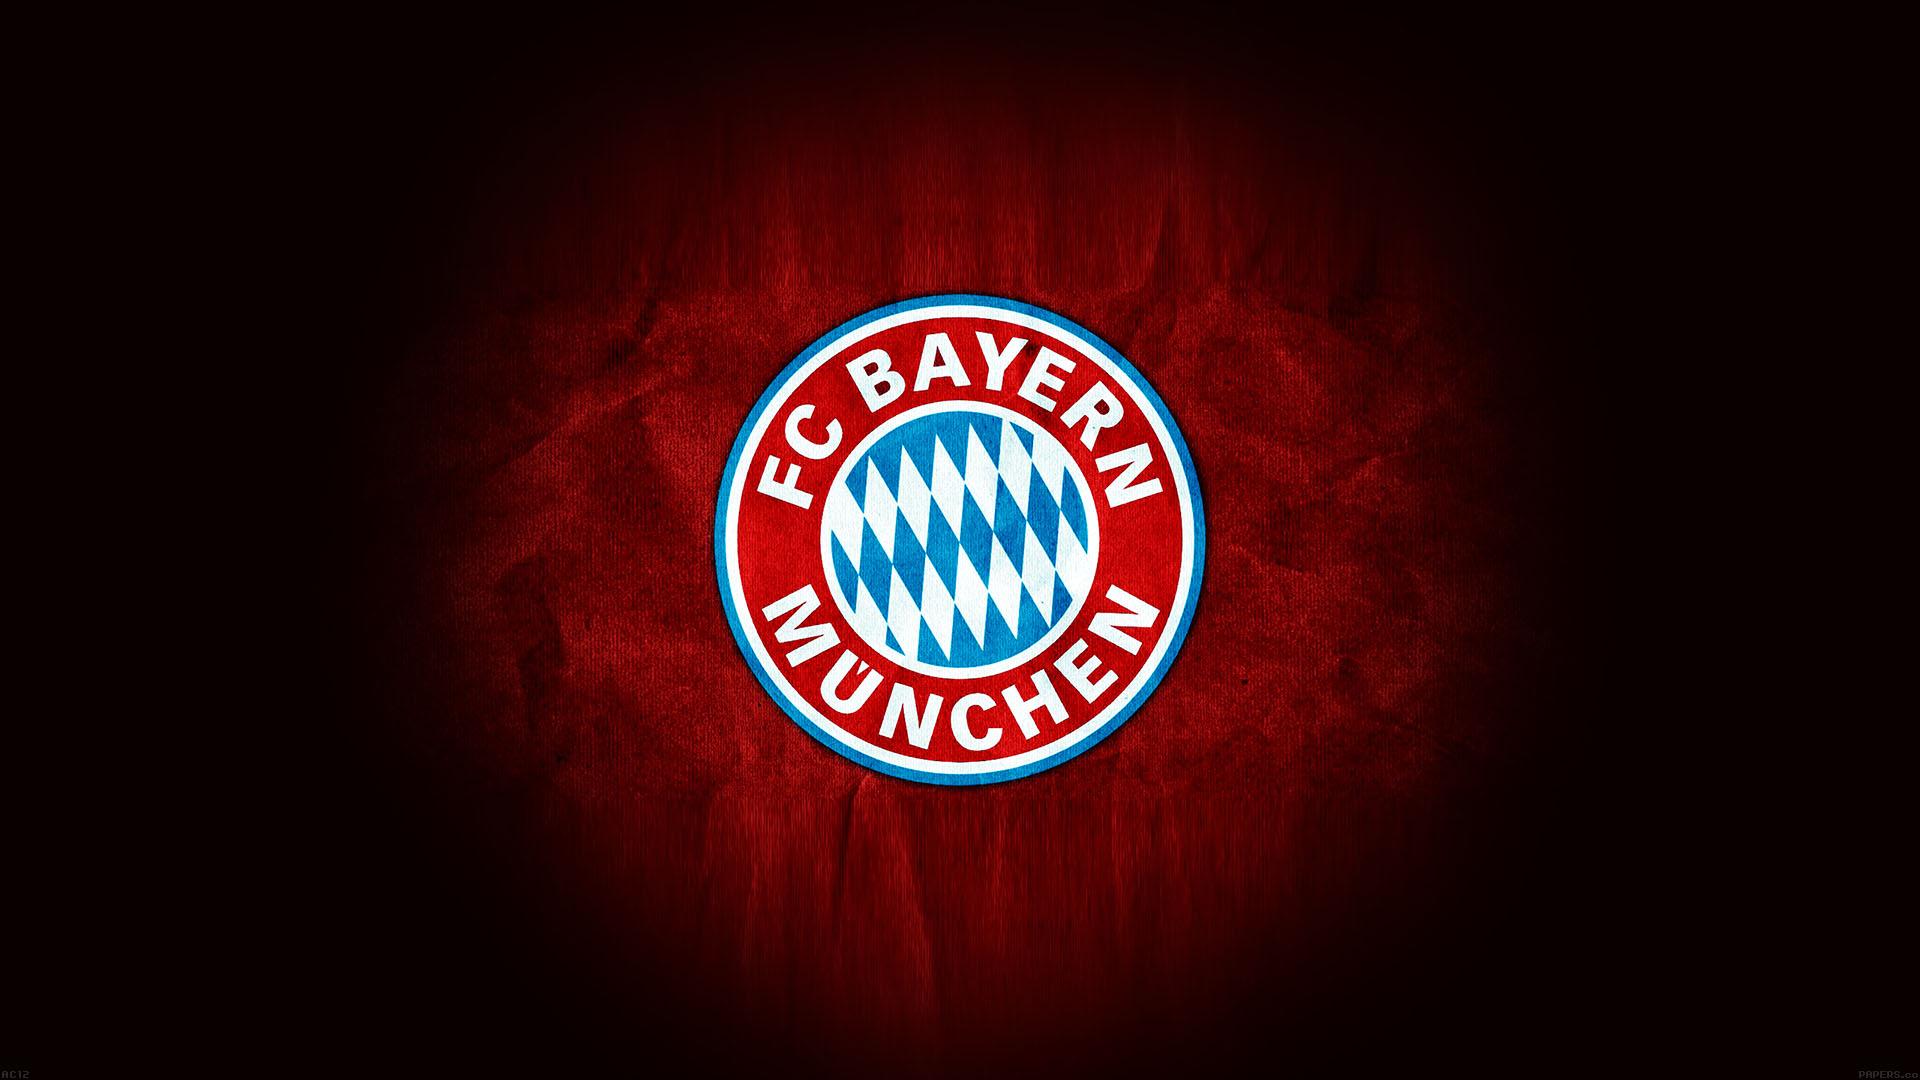 ac12-wallpaper-bayern-munchen-soccer-team-football - Papers.co